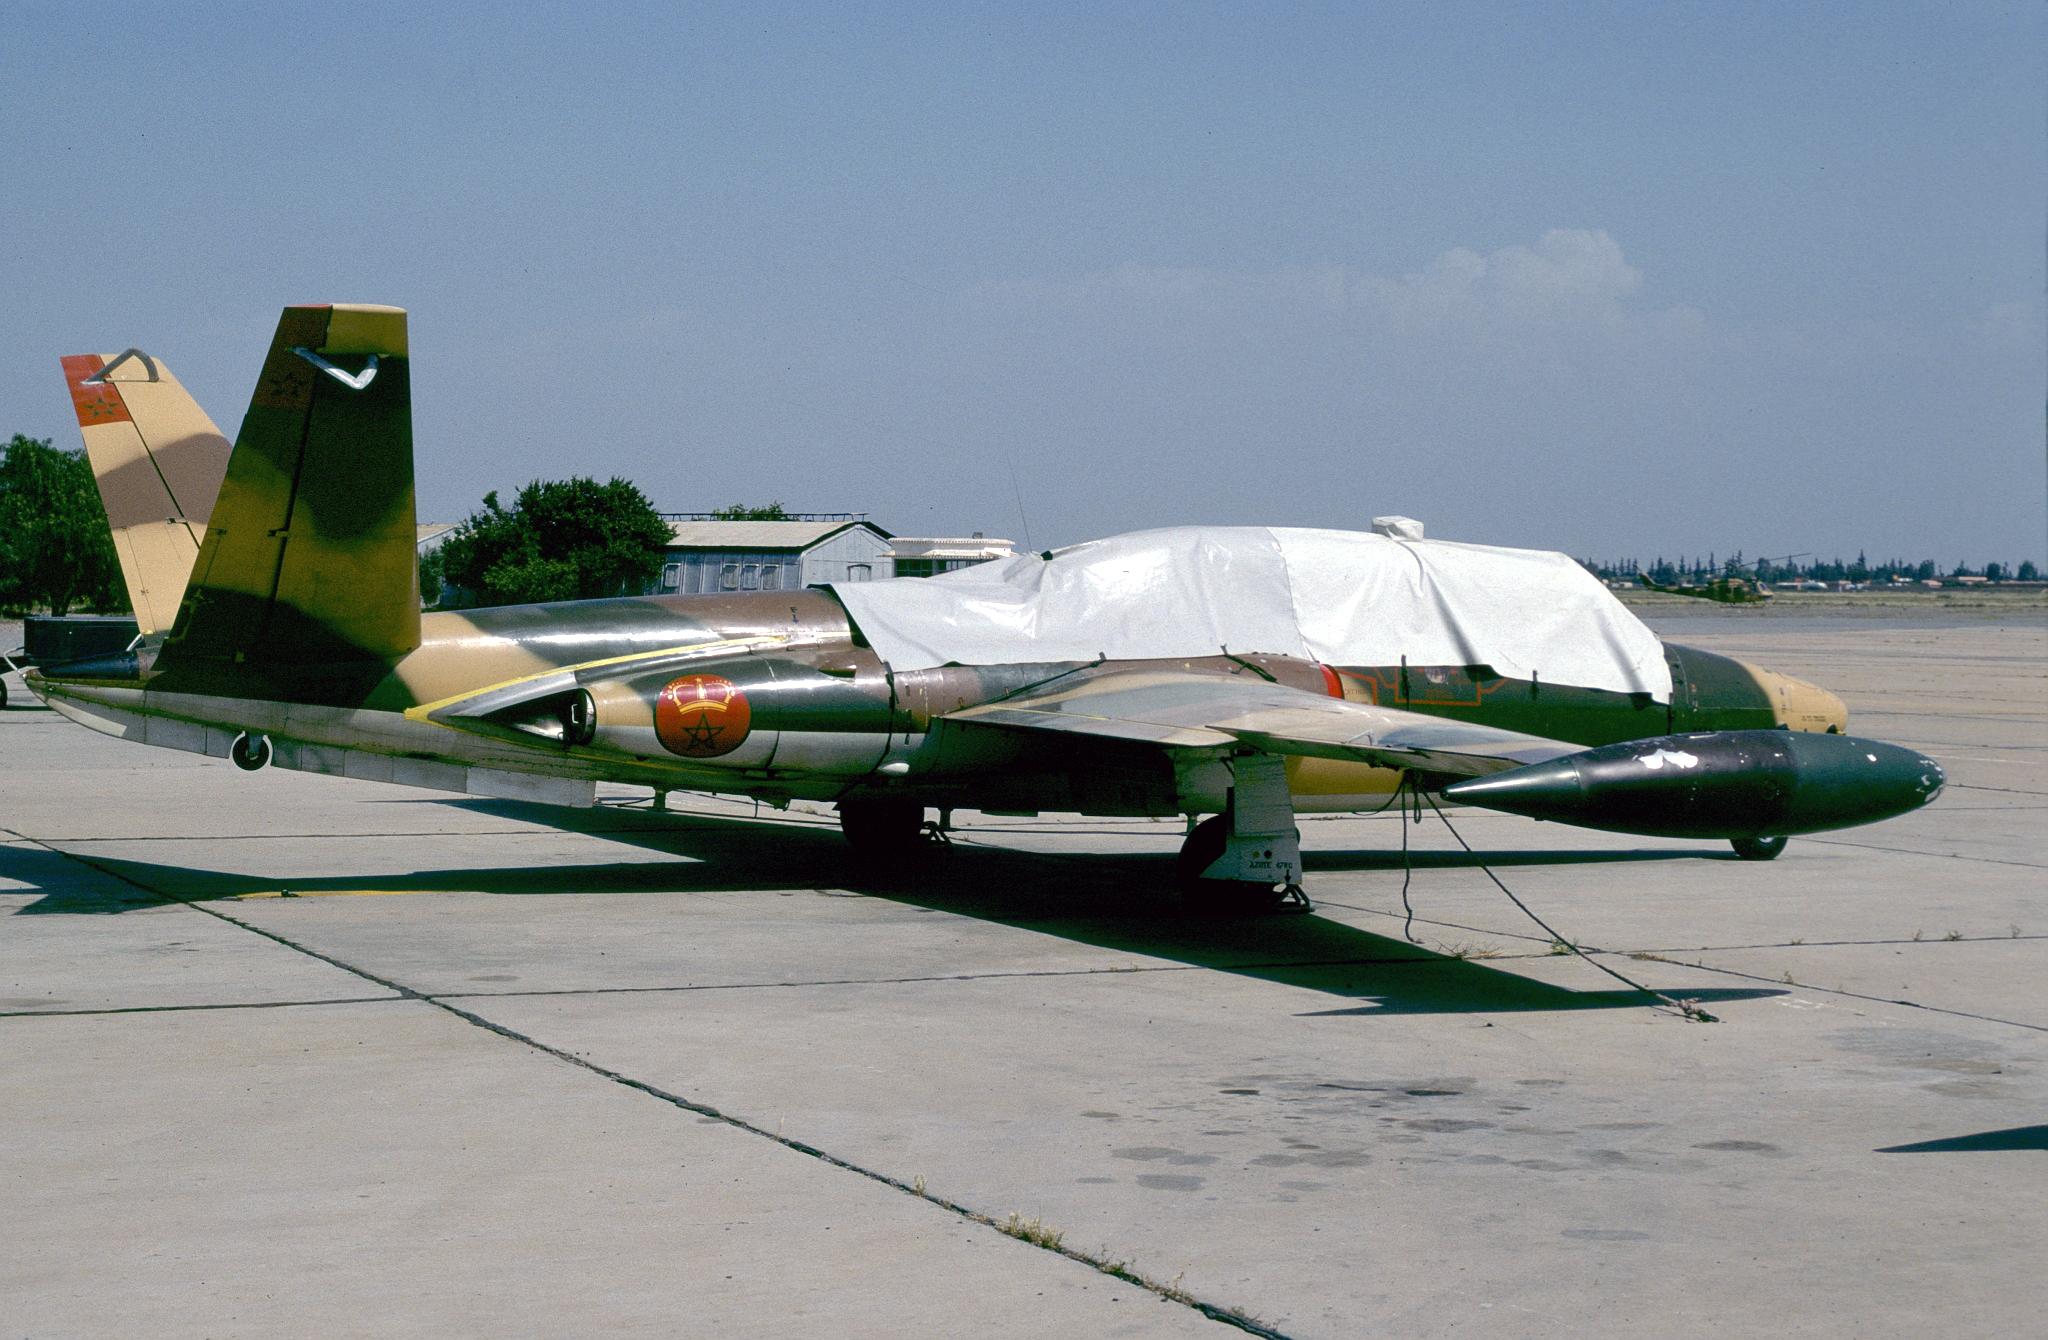 FRA: Photos anciens avions des FRA - Page 13 30513922064_0ffd34462c_o_d